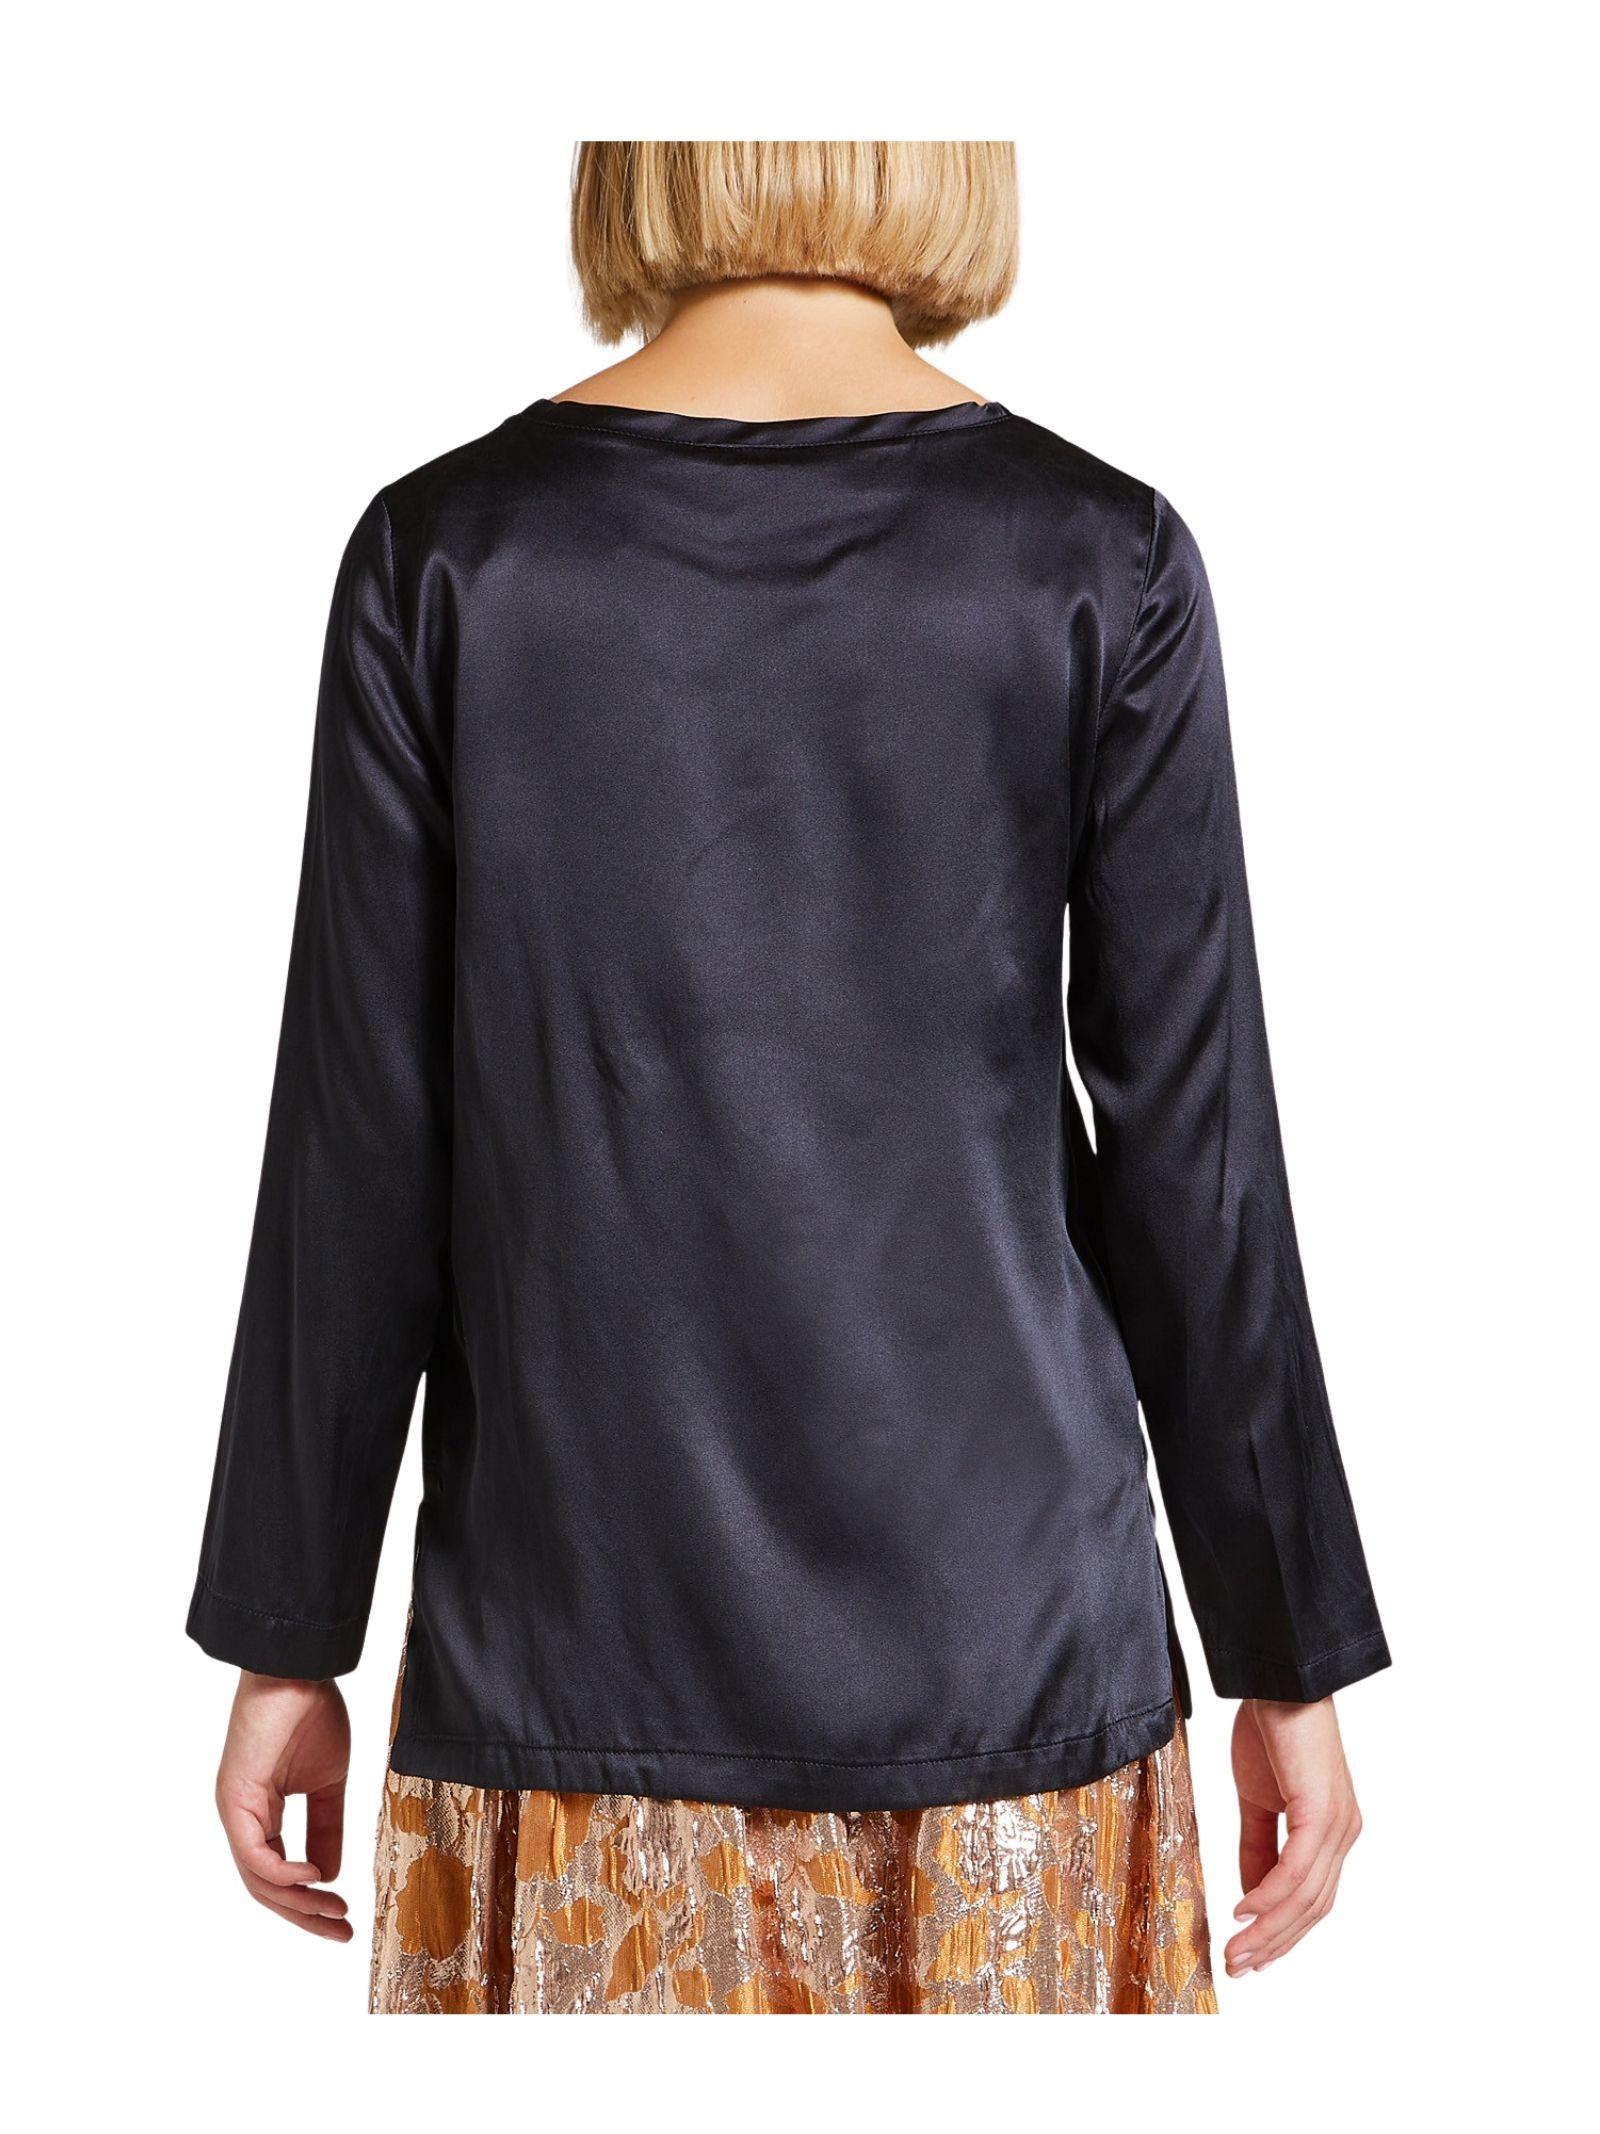 Women's Black T-shirt Maliparmi | Shirts and tops | JM40603102120000